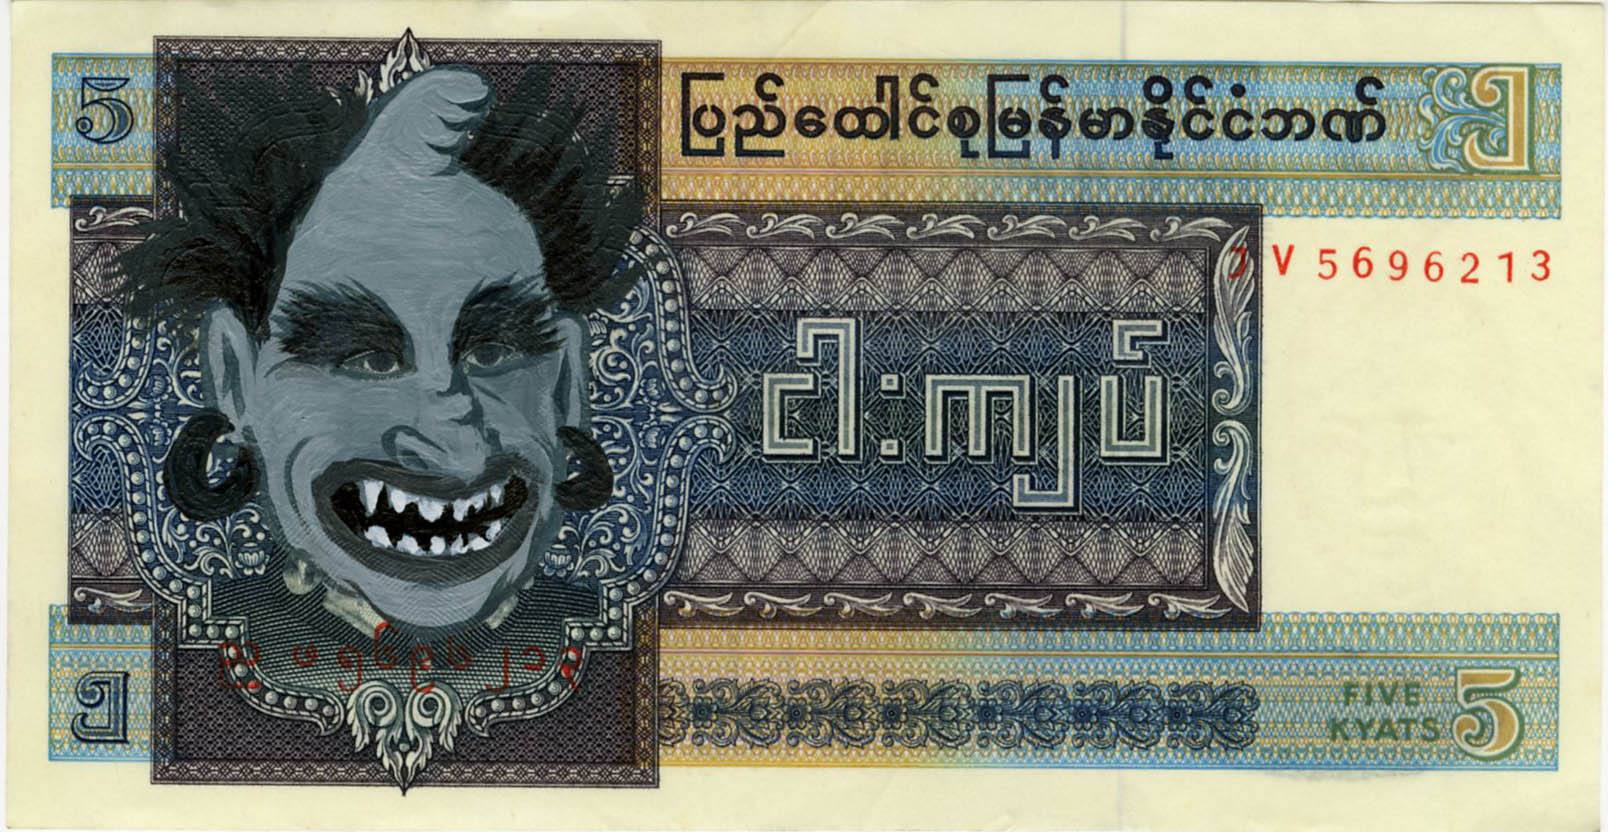 Moneytheism_MYANMAR